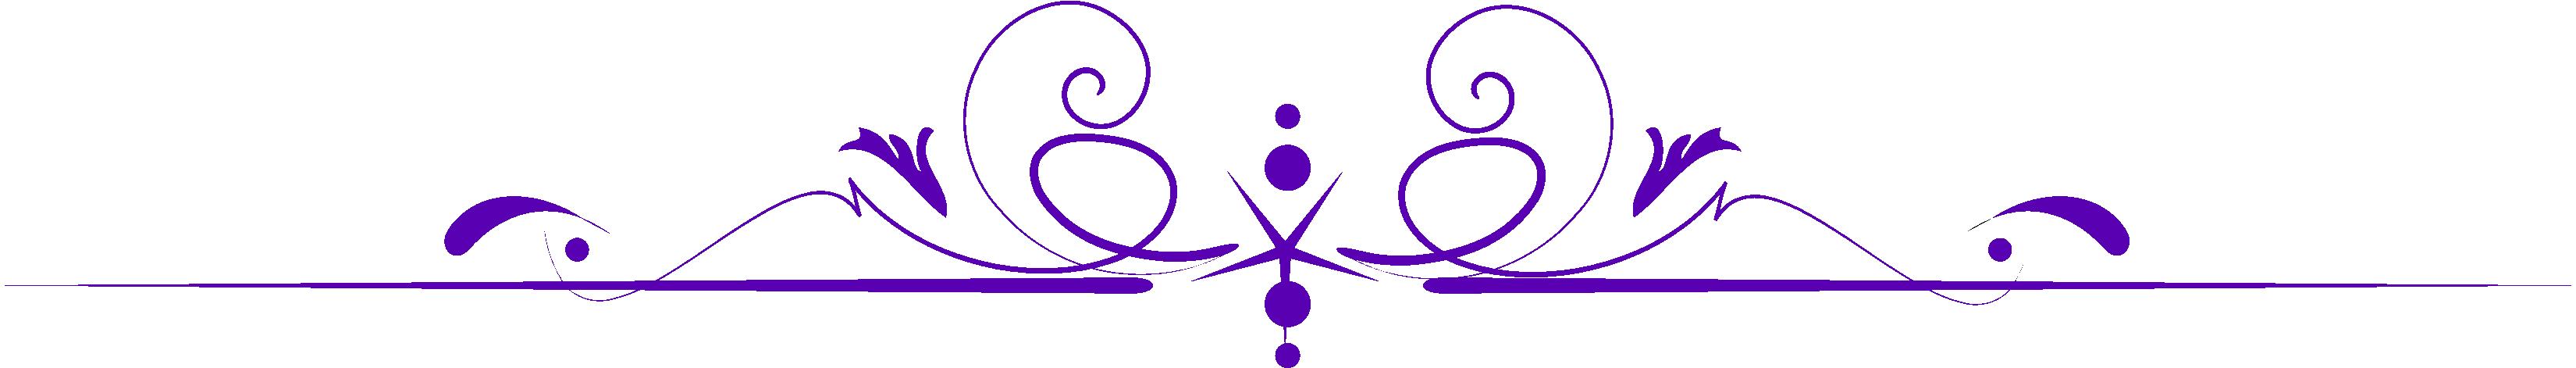 svg transparent stock Line clipart purple. Divider free on dumielauxepices.